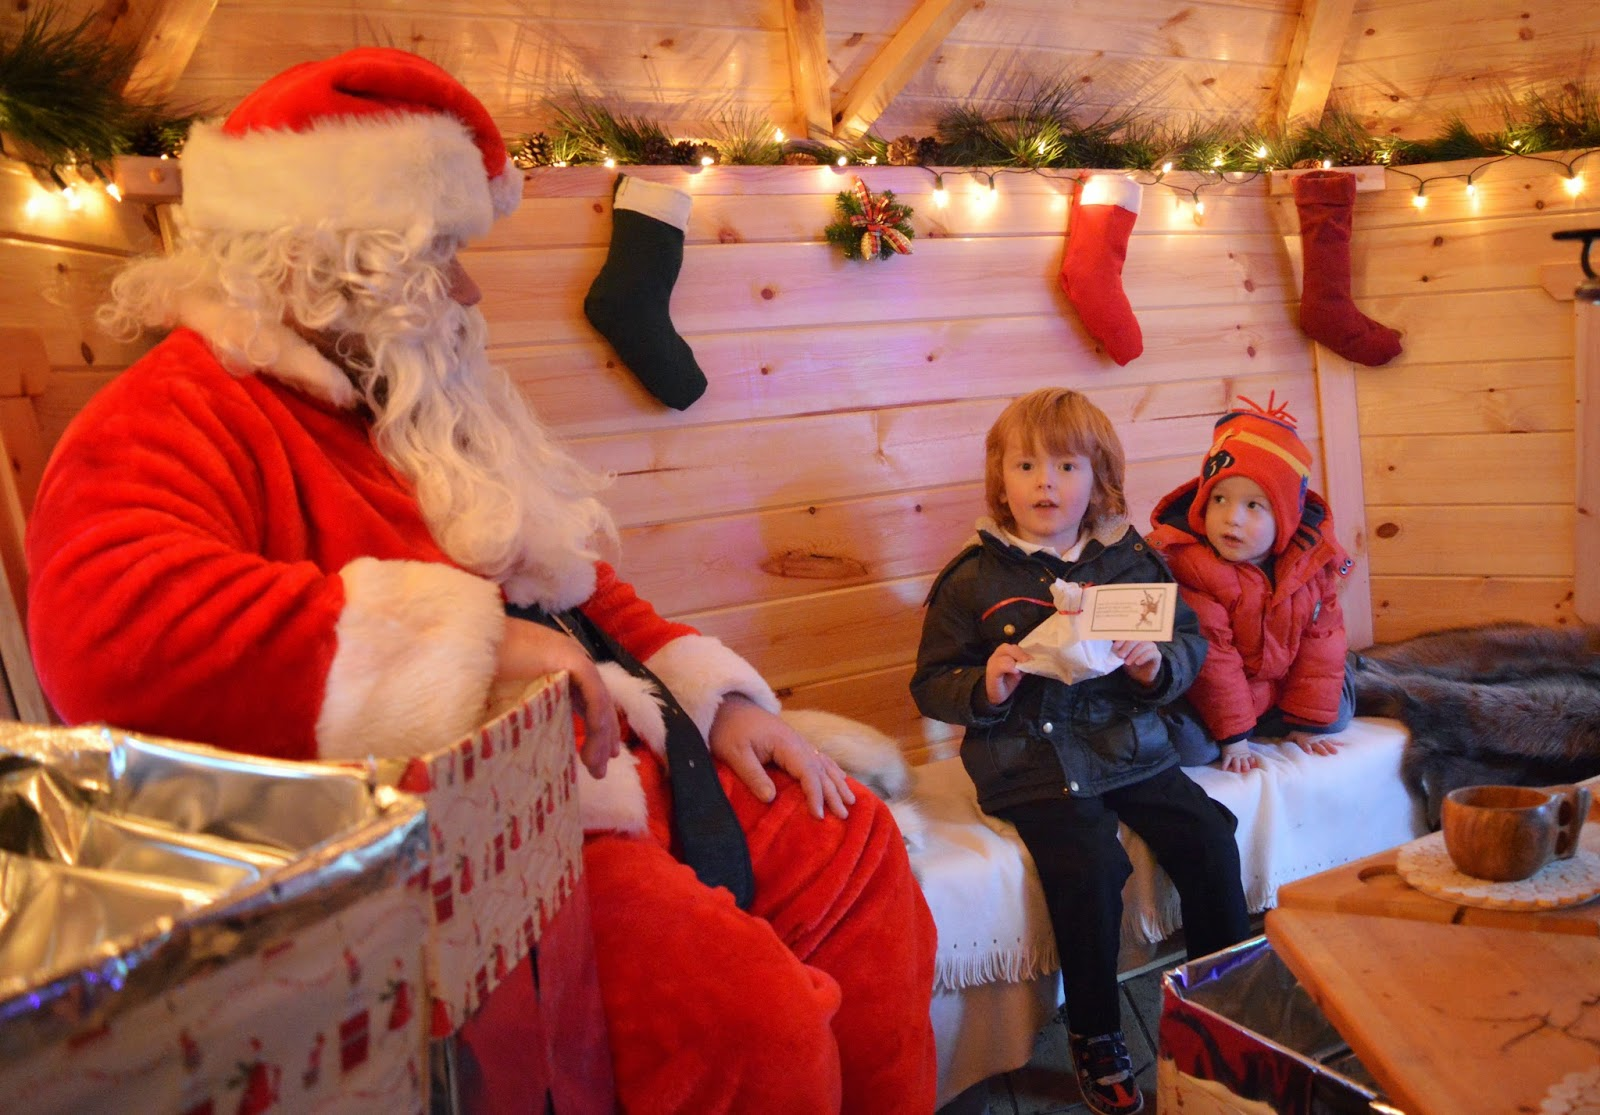 Santa's Grotto at Rising Sun Countryside Centre, North Tyneside - A review - visiting Santa in his grotto